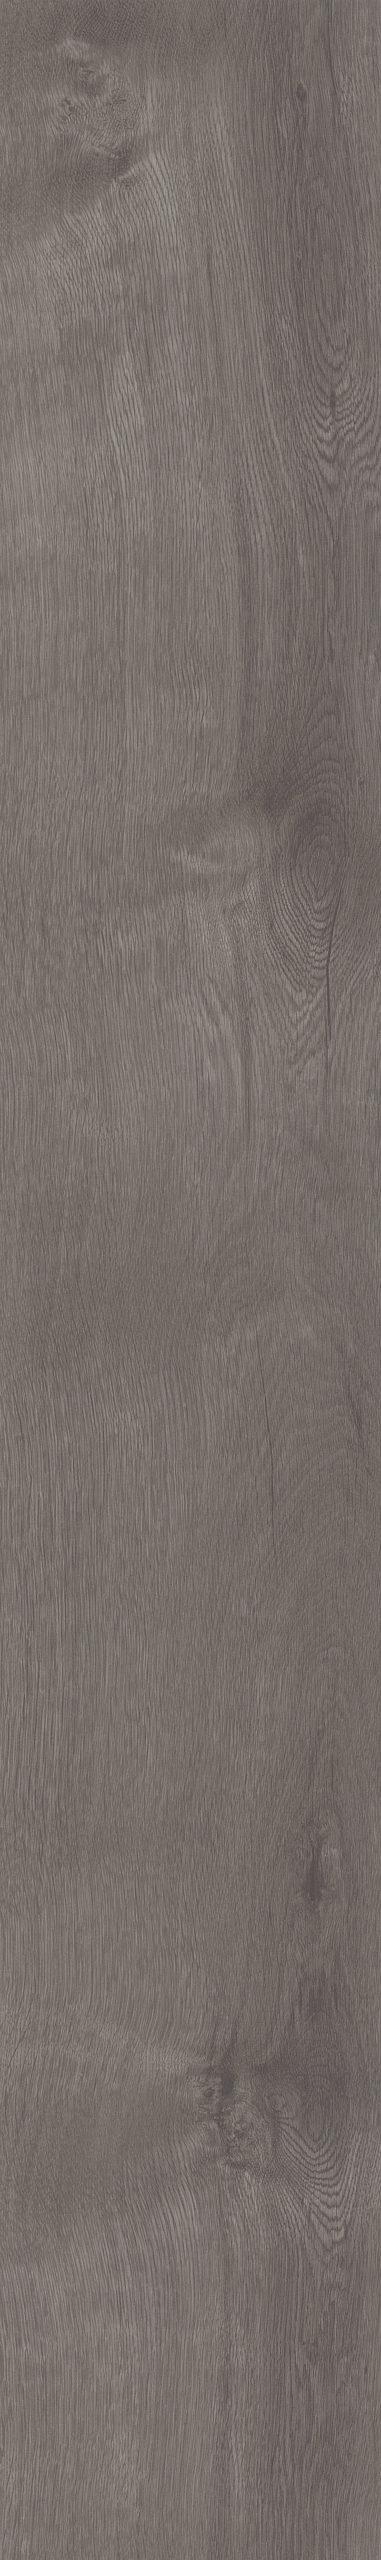 Parva Broad Leaf Grey Sycamore